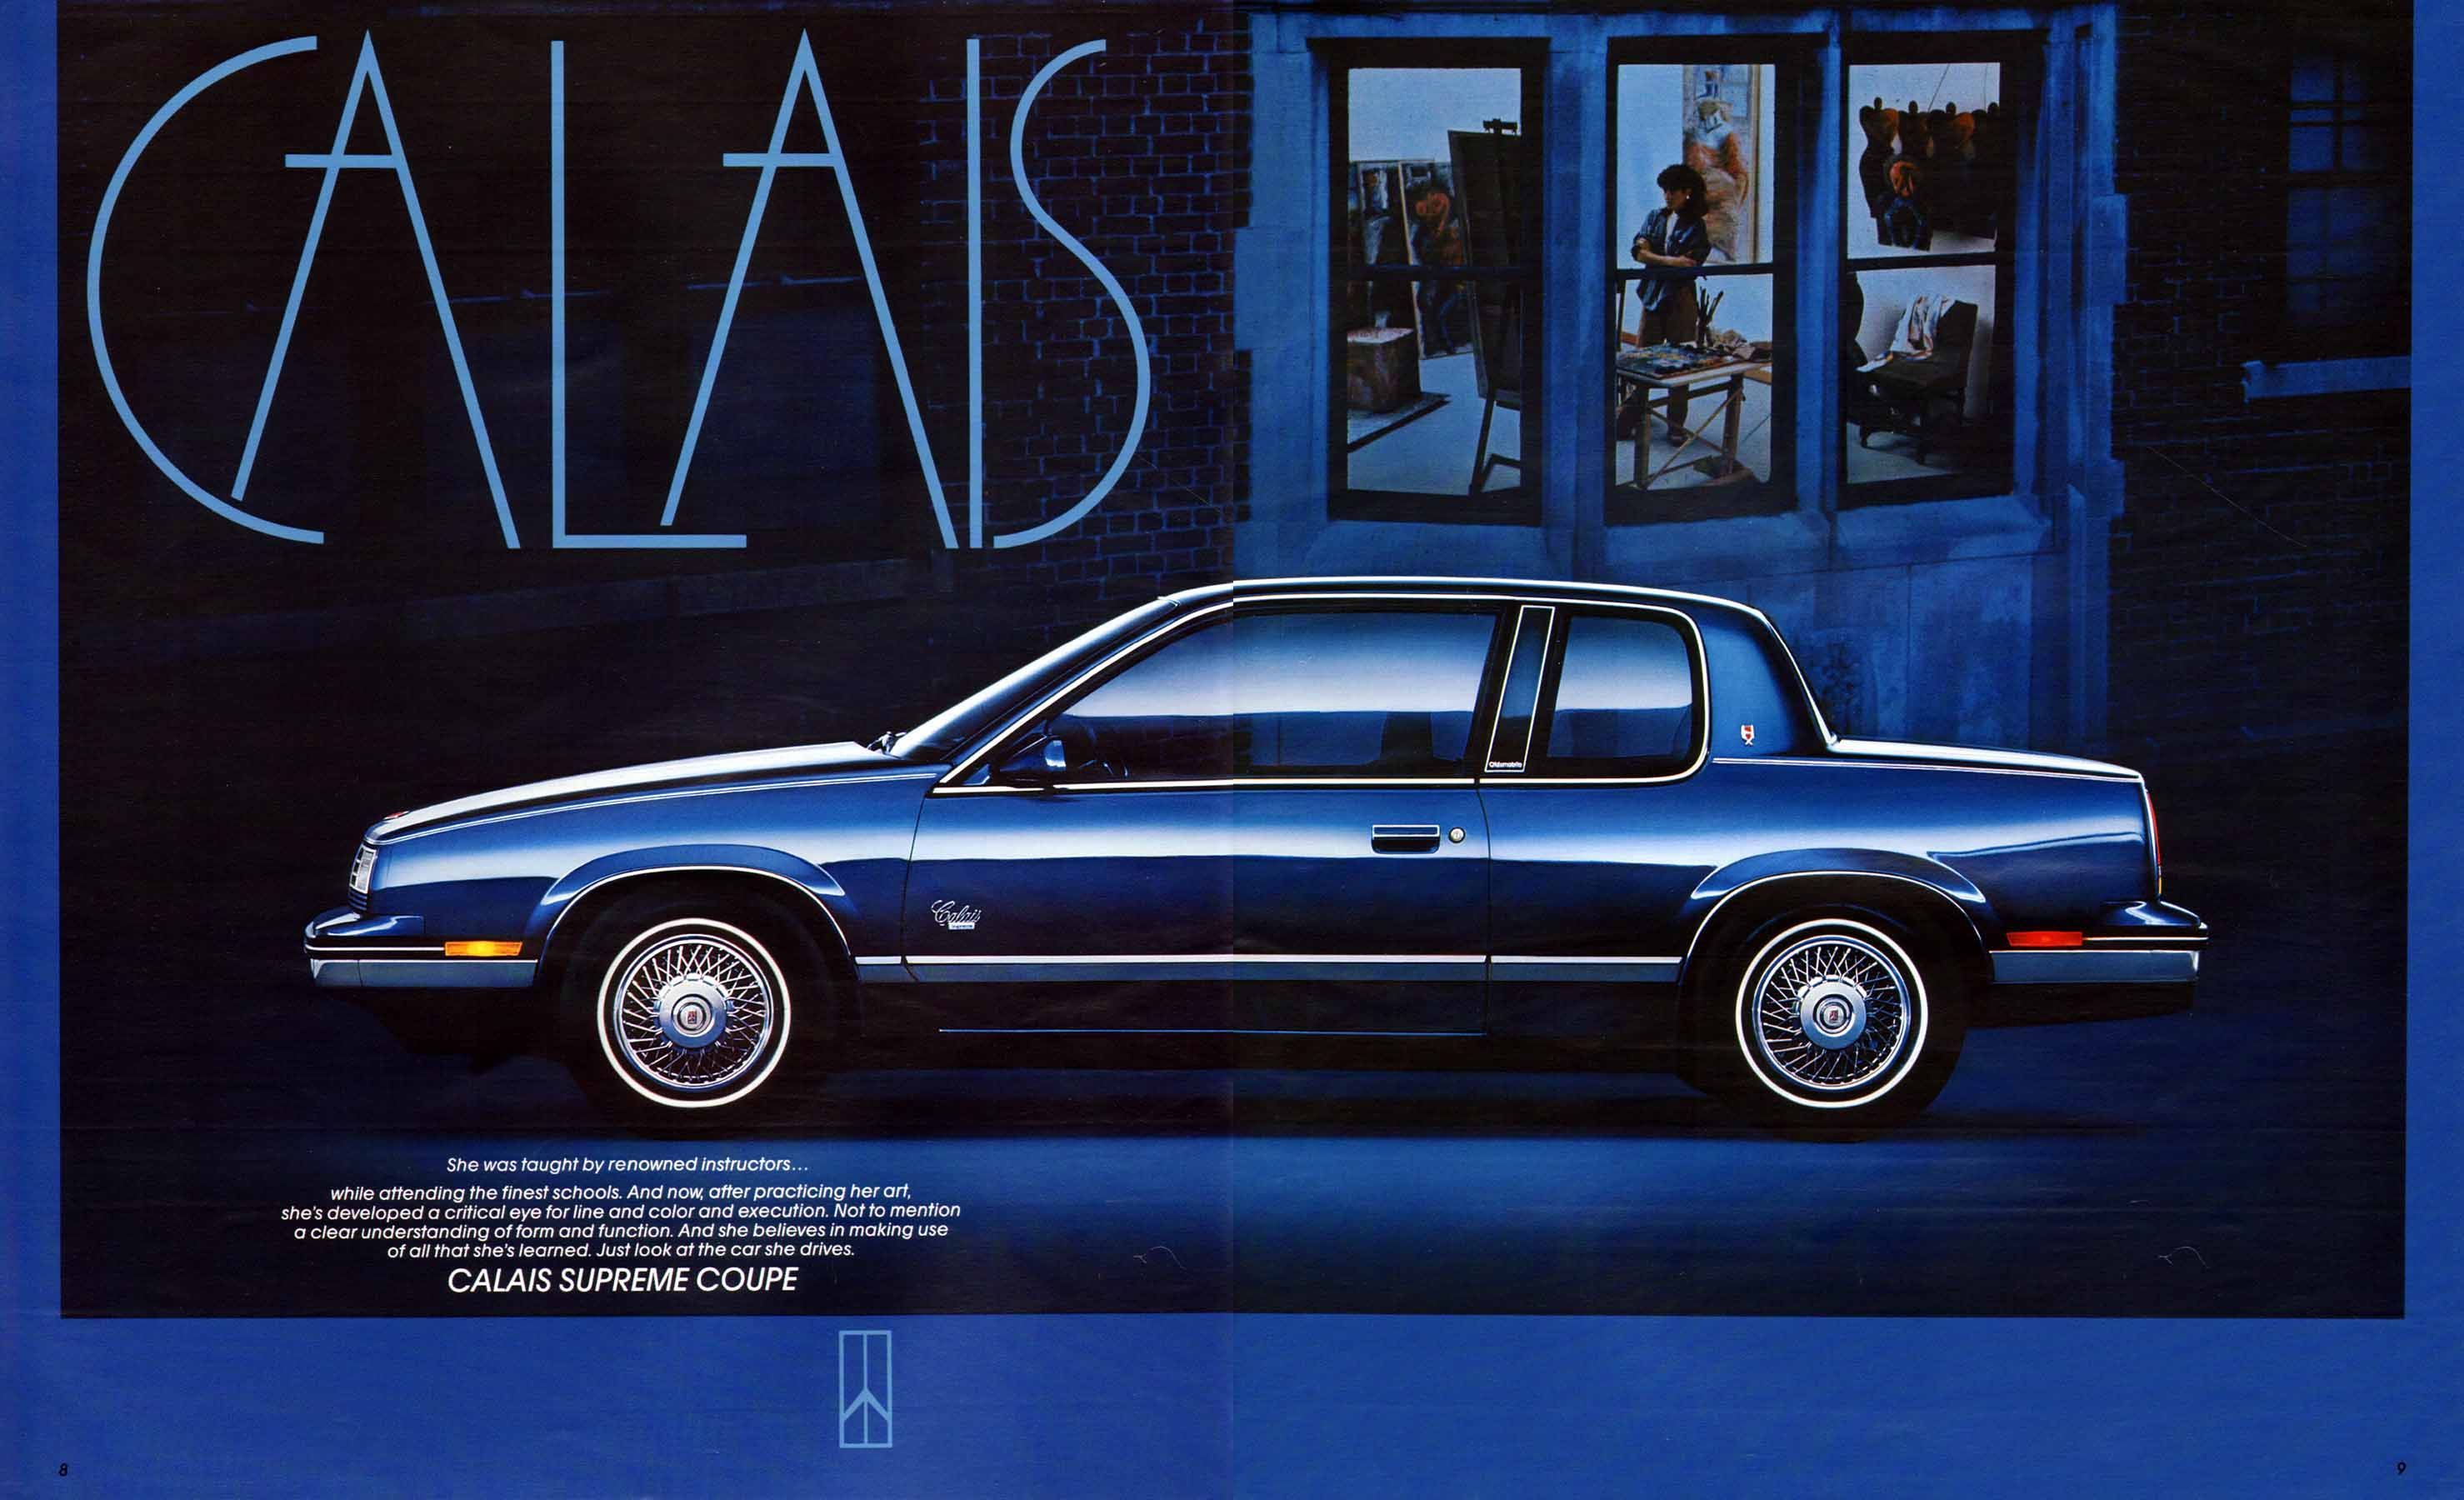 1987 Oldsmobile Calais Supreme Coupe Same Color Blue Had Cool